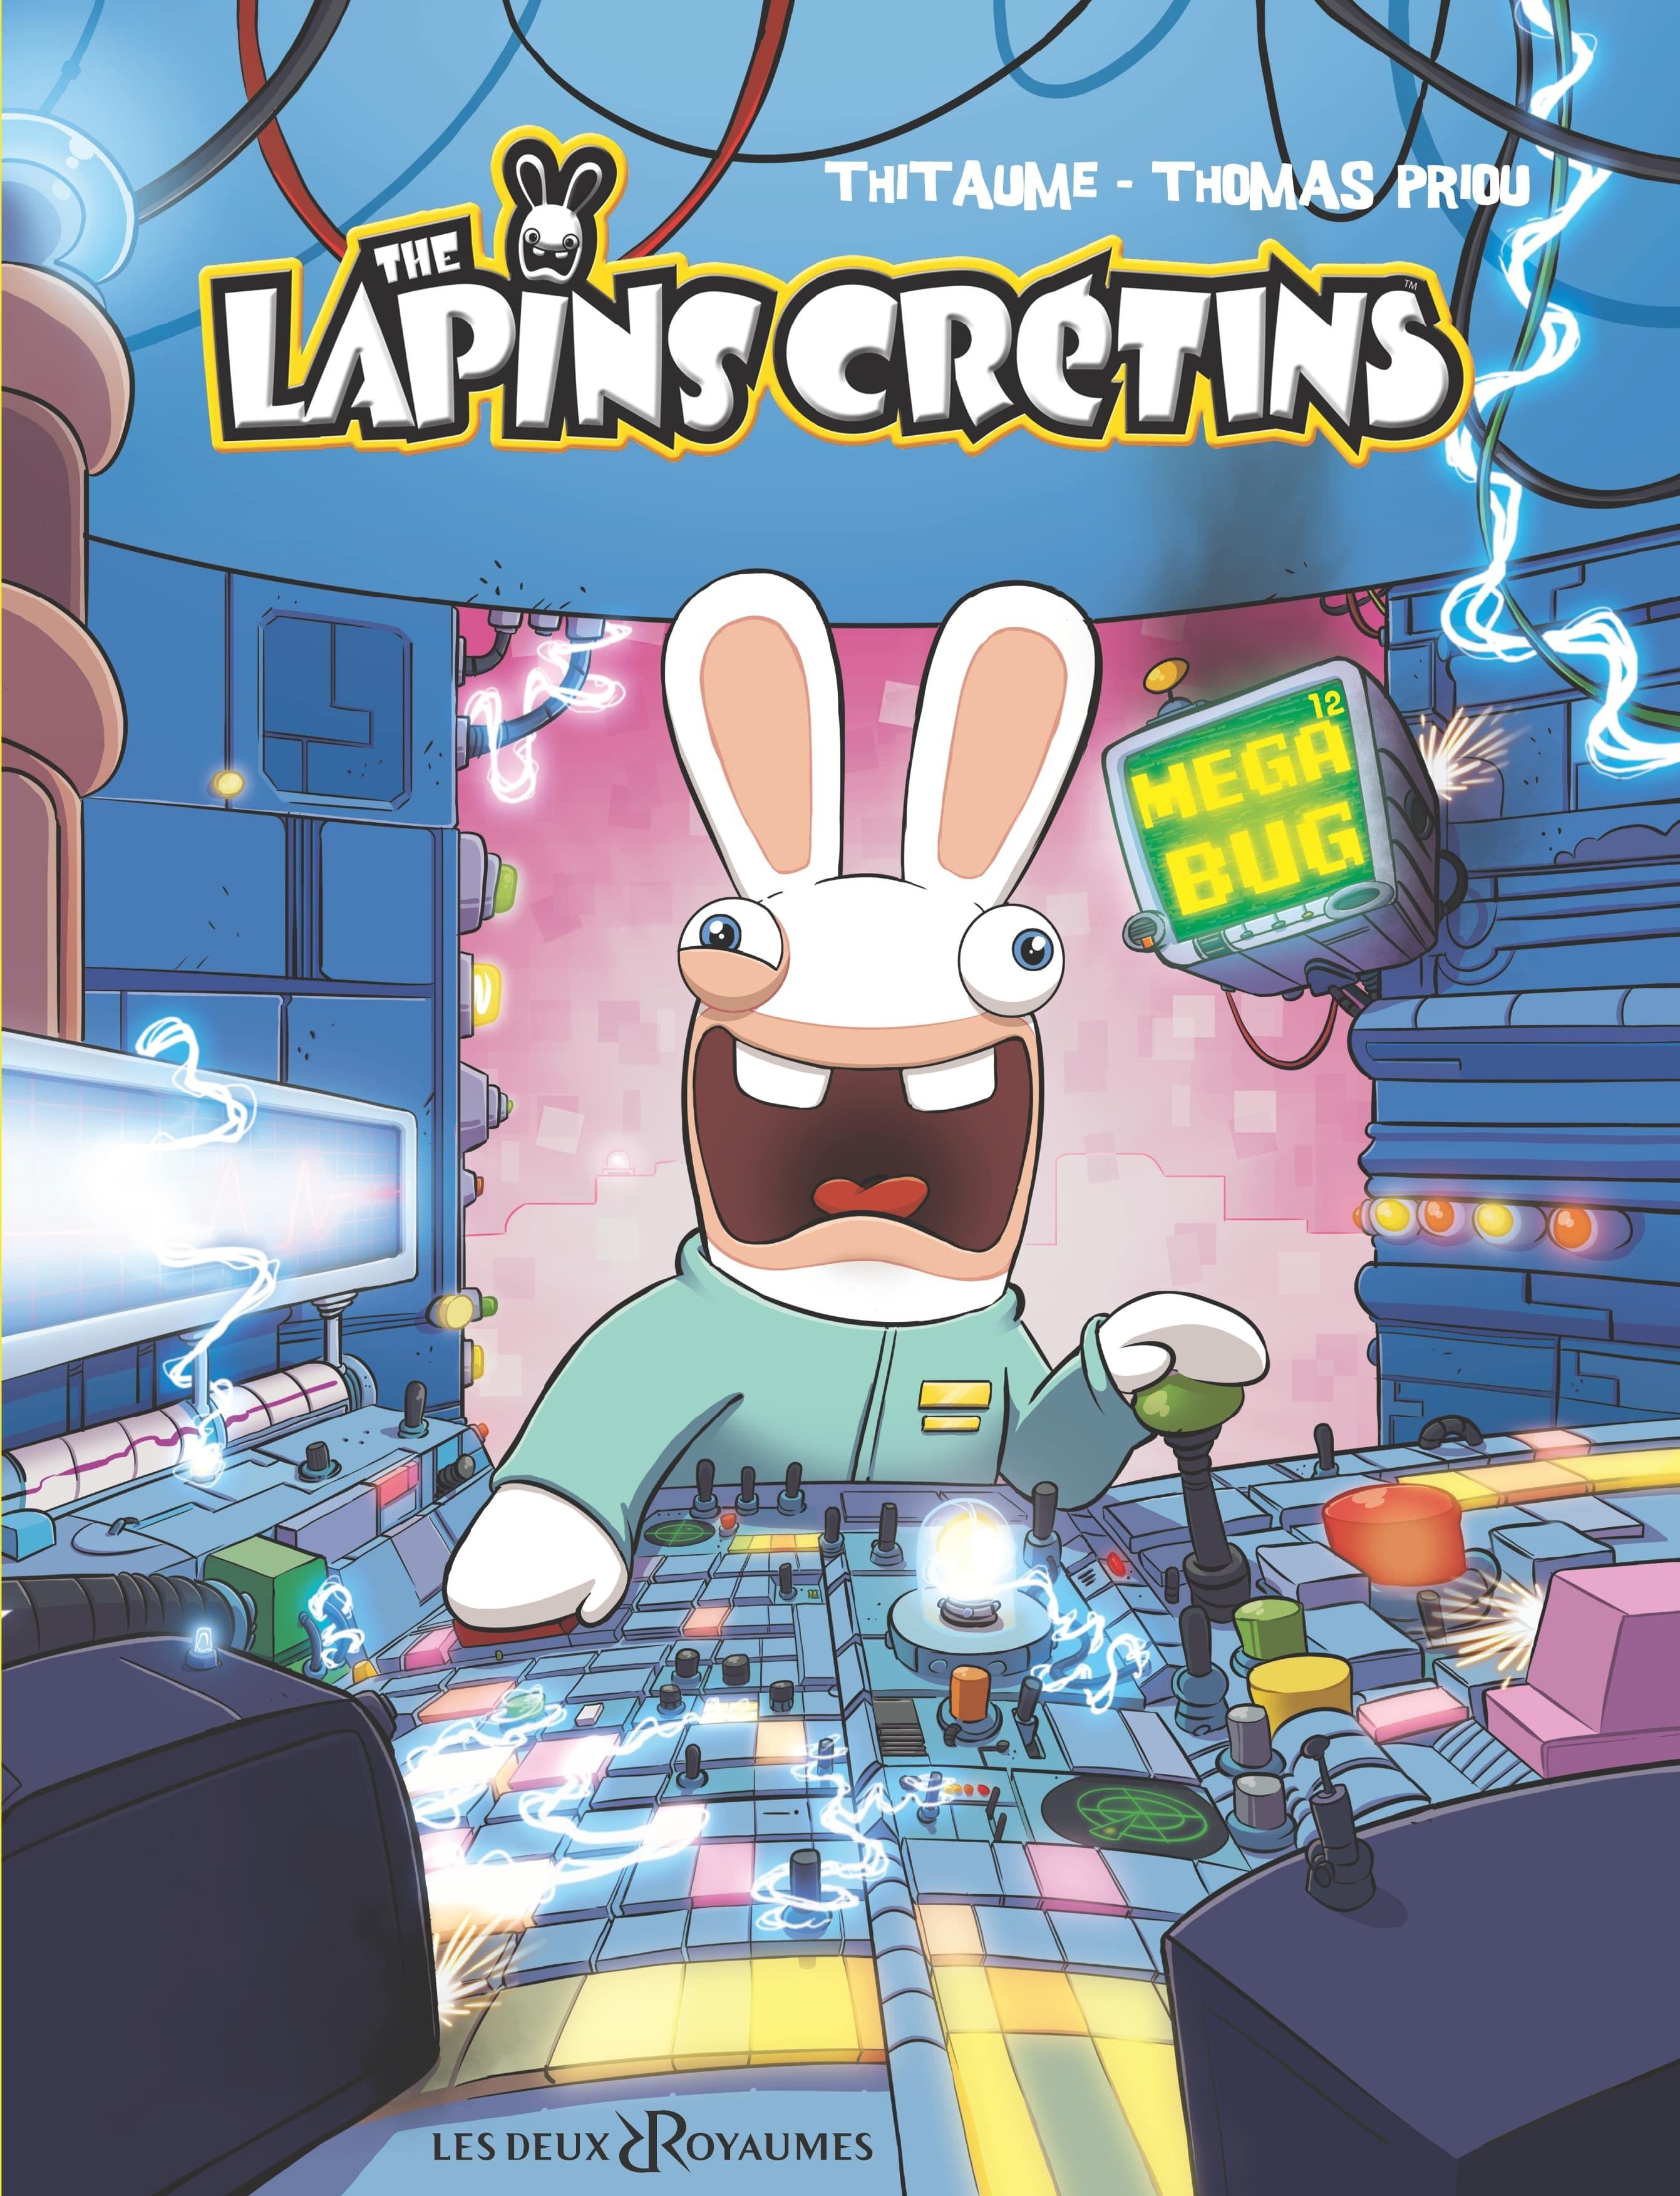 THE LAPINS CRETINS - TOME 12 - MEGA BUG